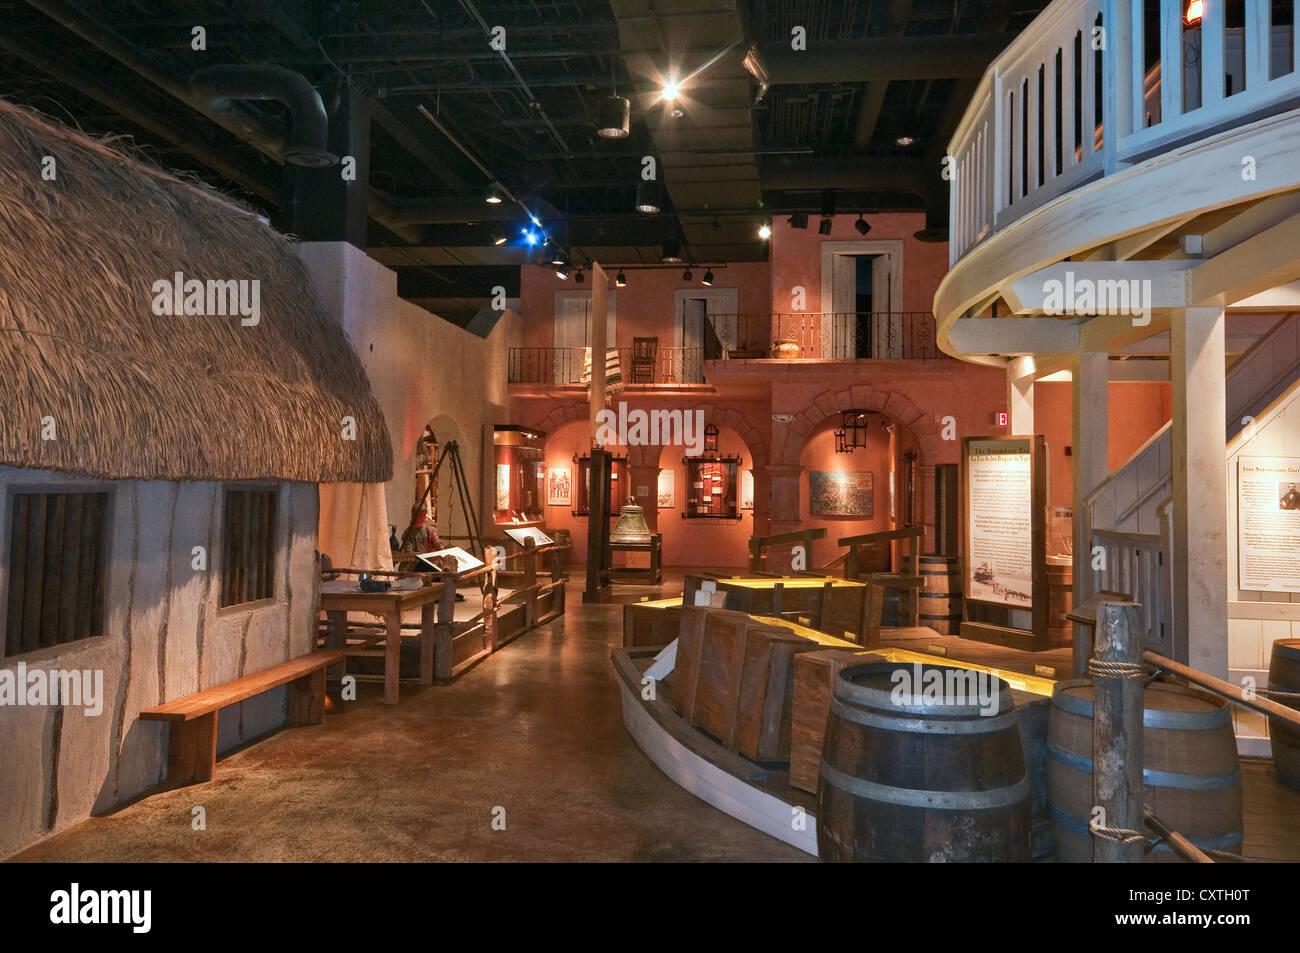 Exhibition room at Museum of South Texas History, Edinburg, Rio Grande Valley, Texas, USA - Stock Image